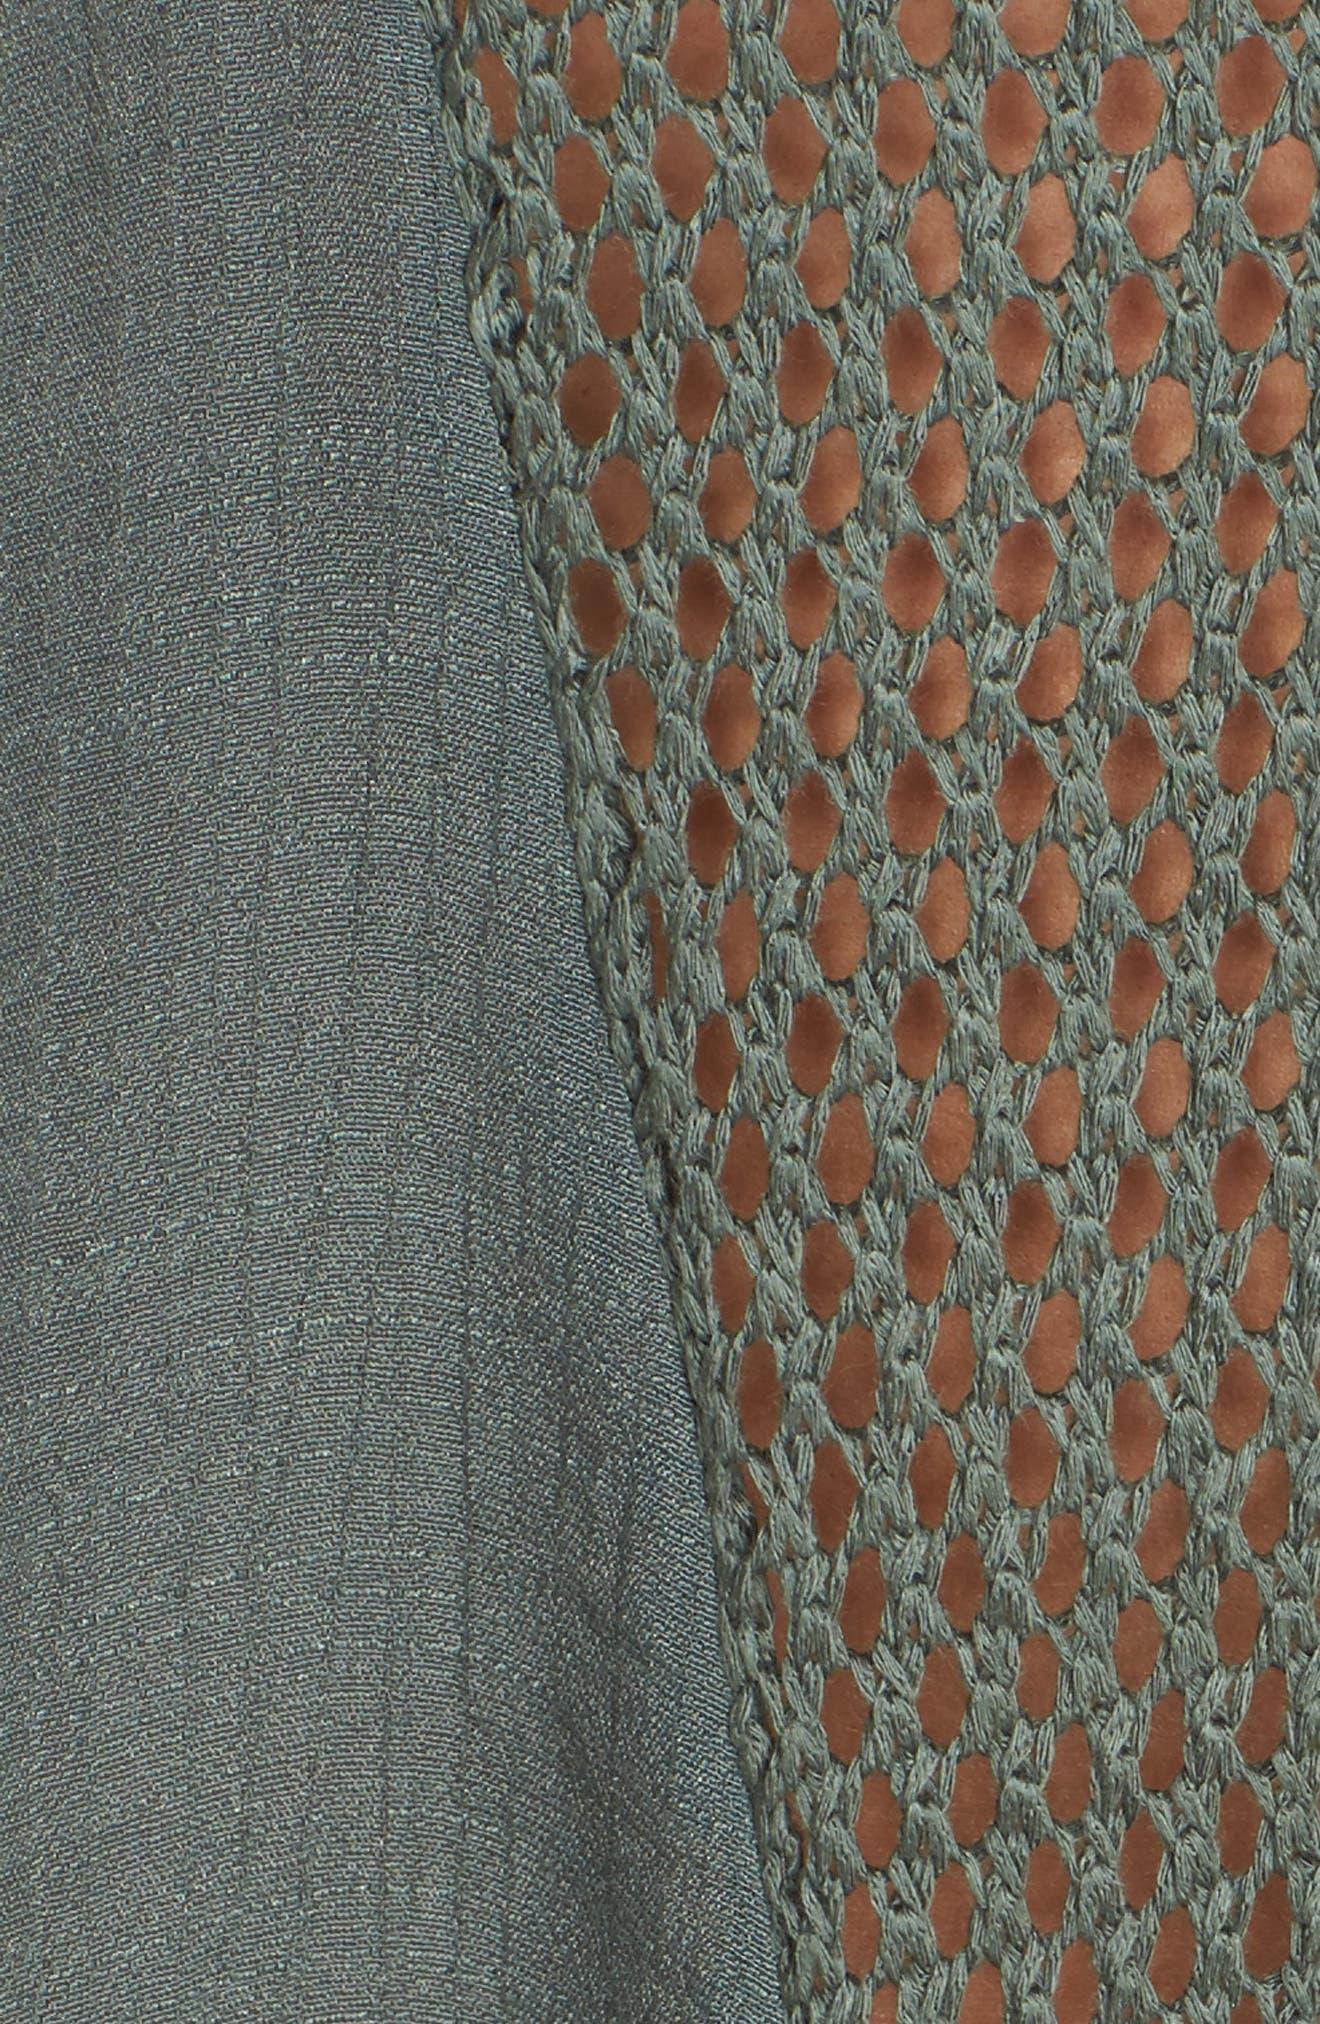 Crochet Inset Cover-Up Dress,                             Alternate thumbnail 5, color,                             302